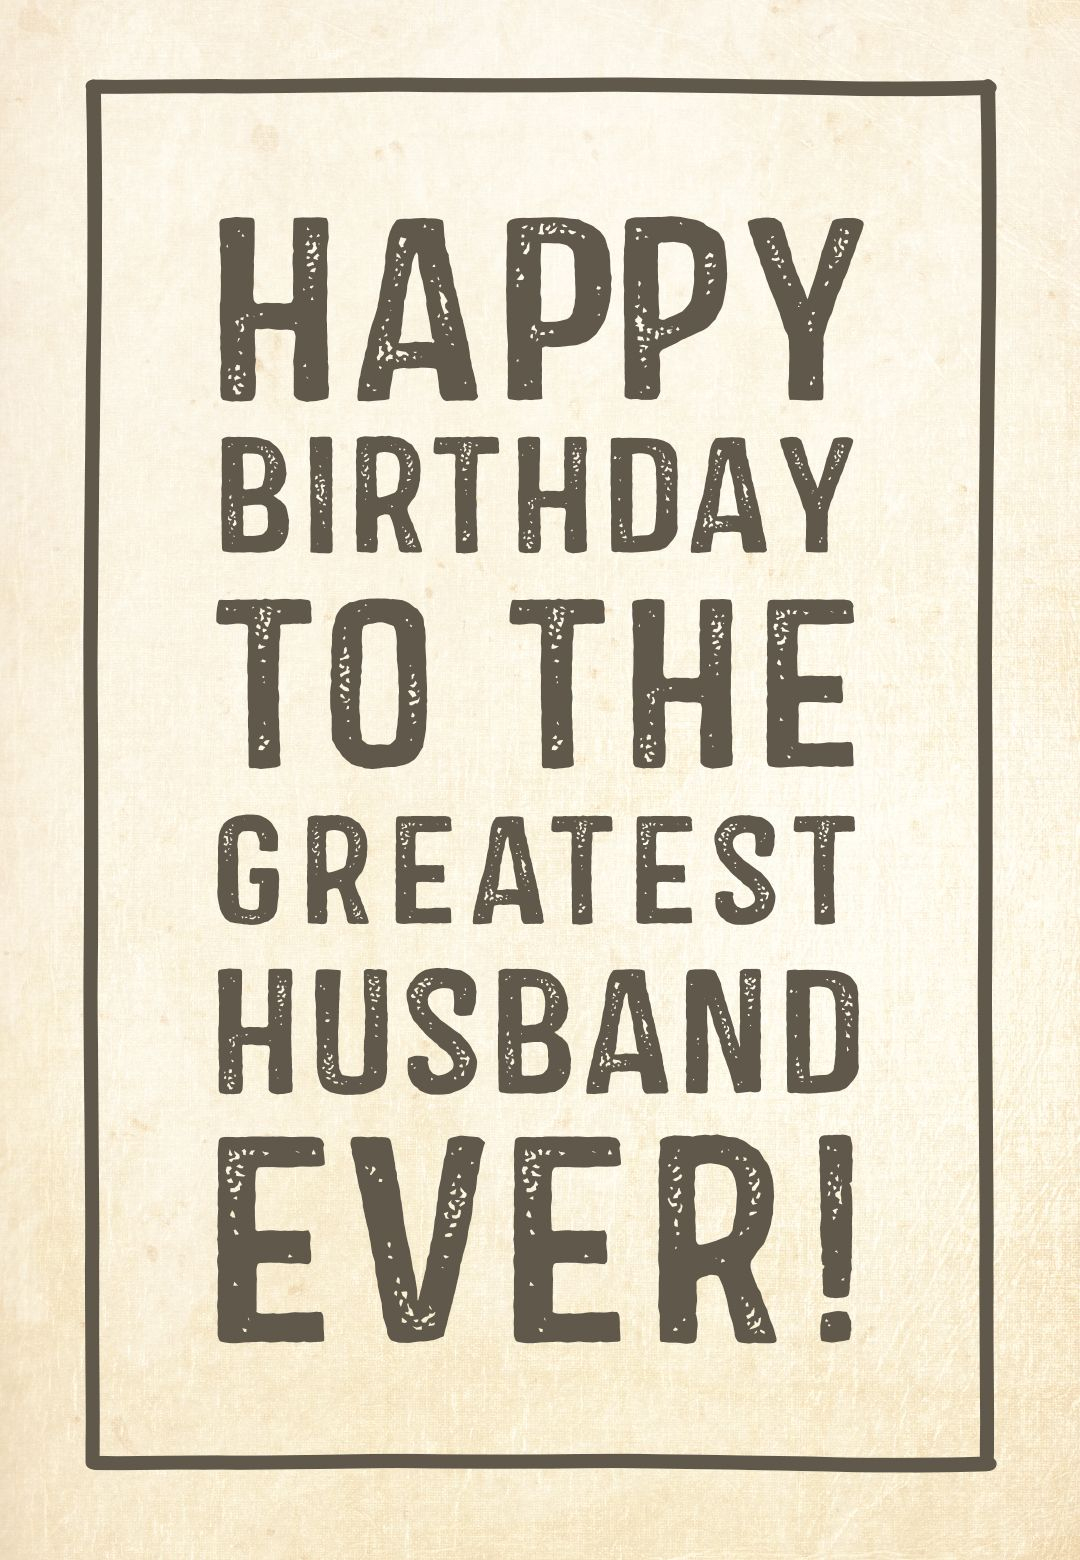 Free Printable Birthday Card - Greatest Husband   Greetings Island - Free Printable Birthday Cards For Husband